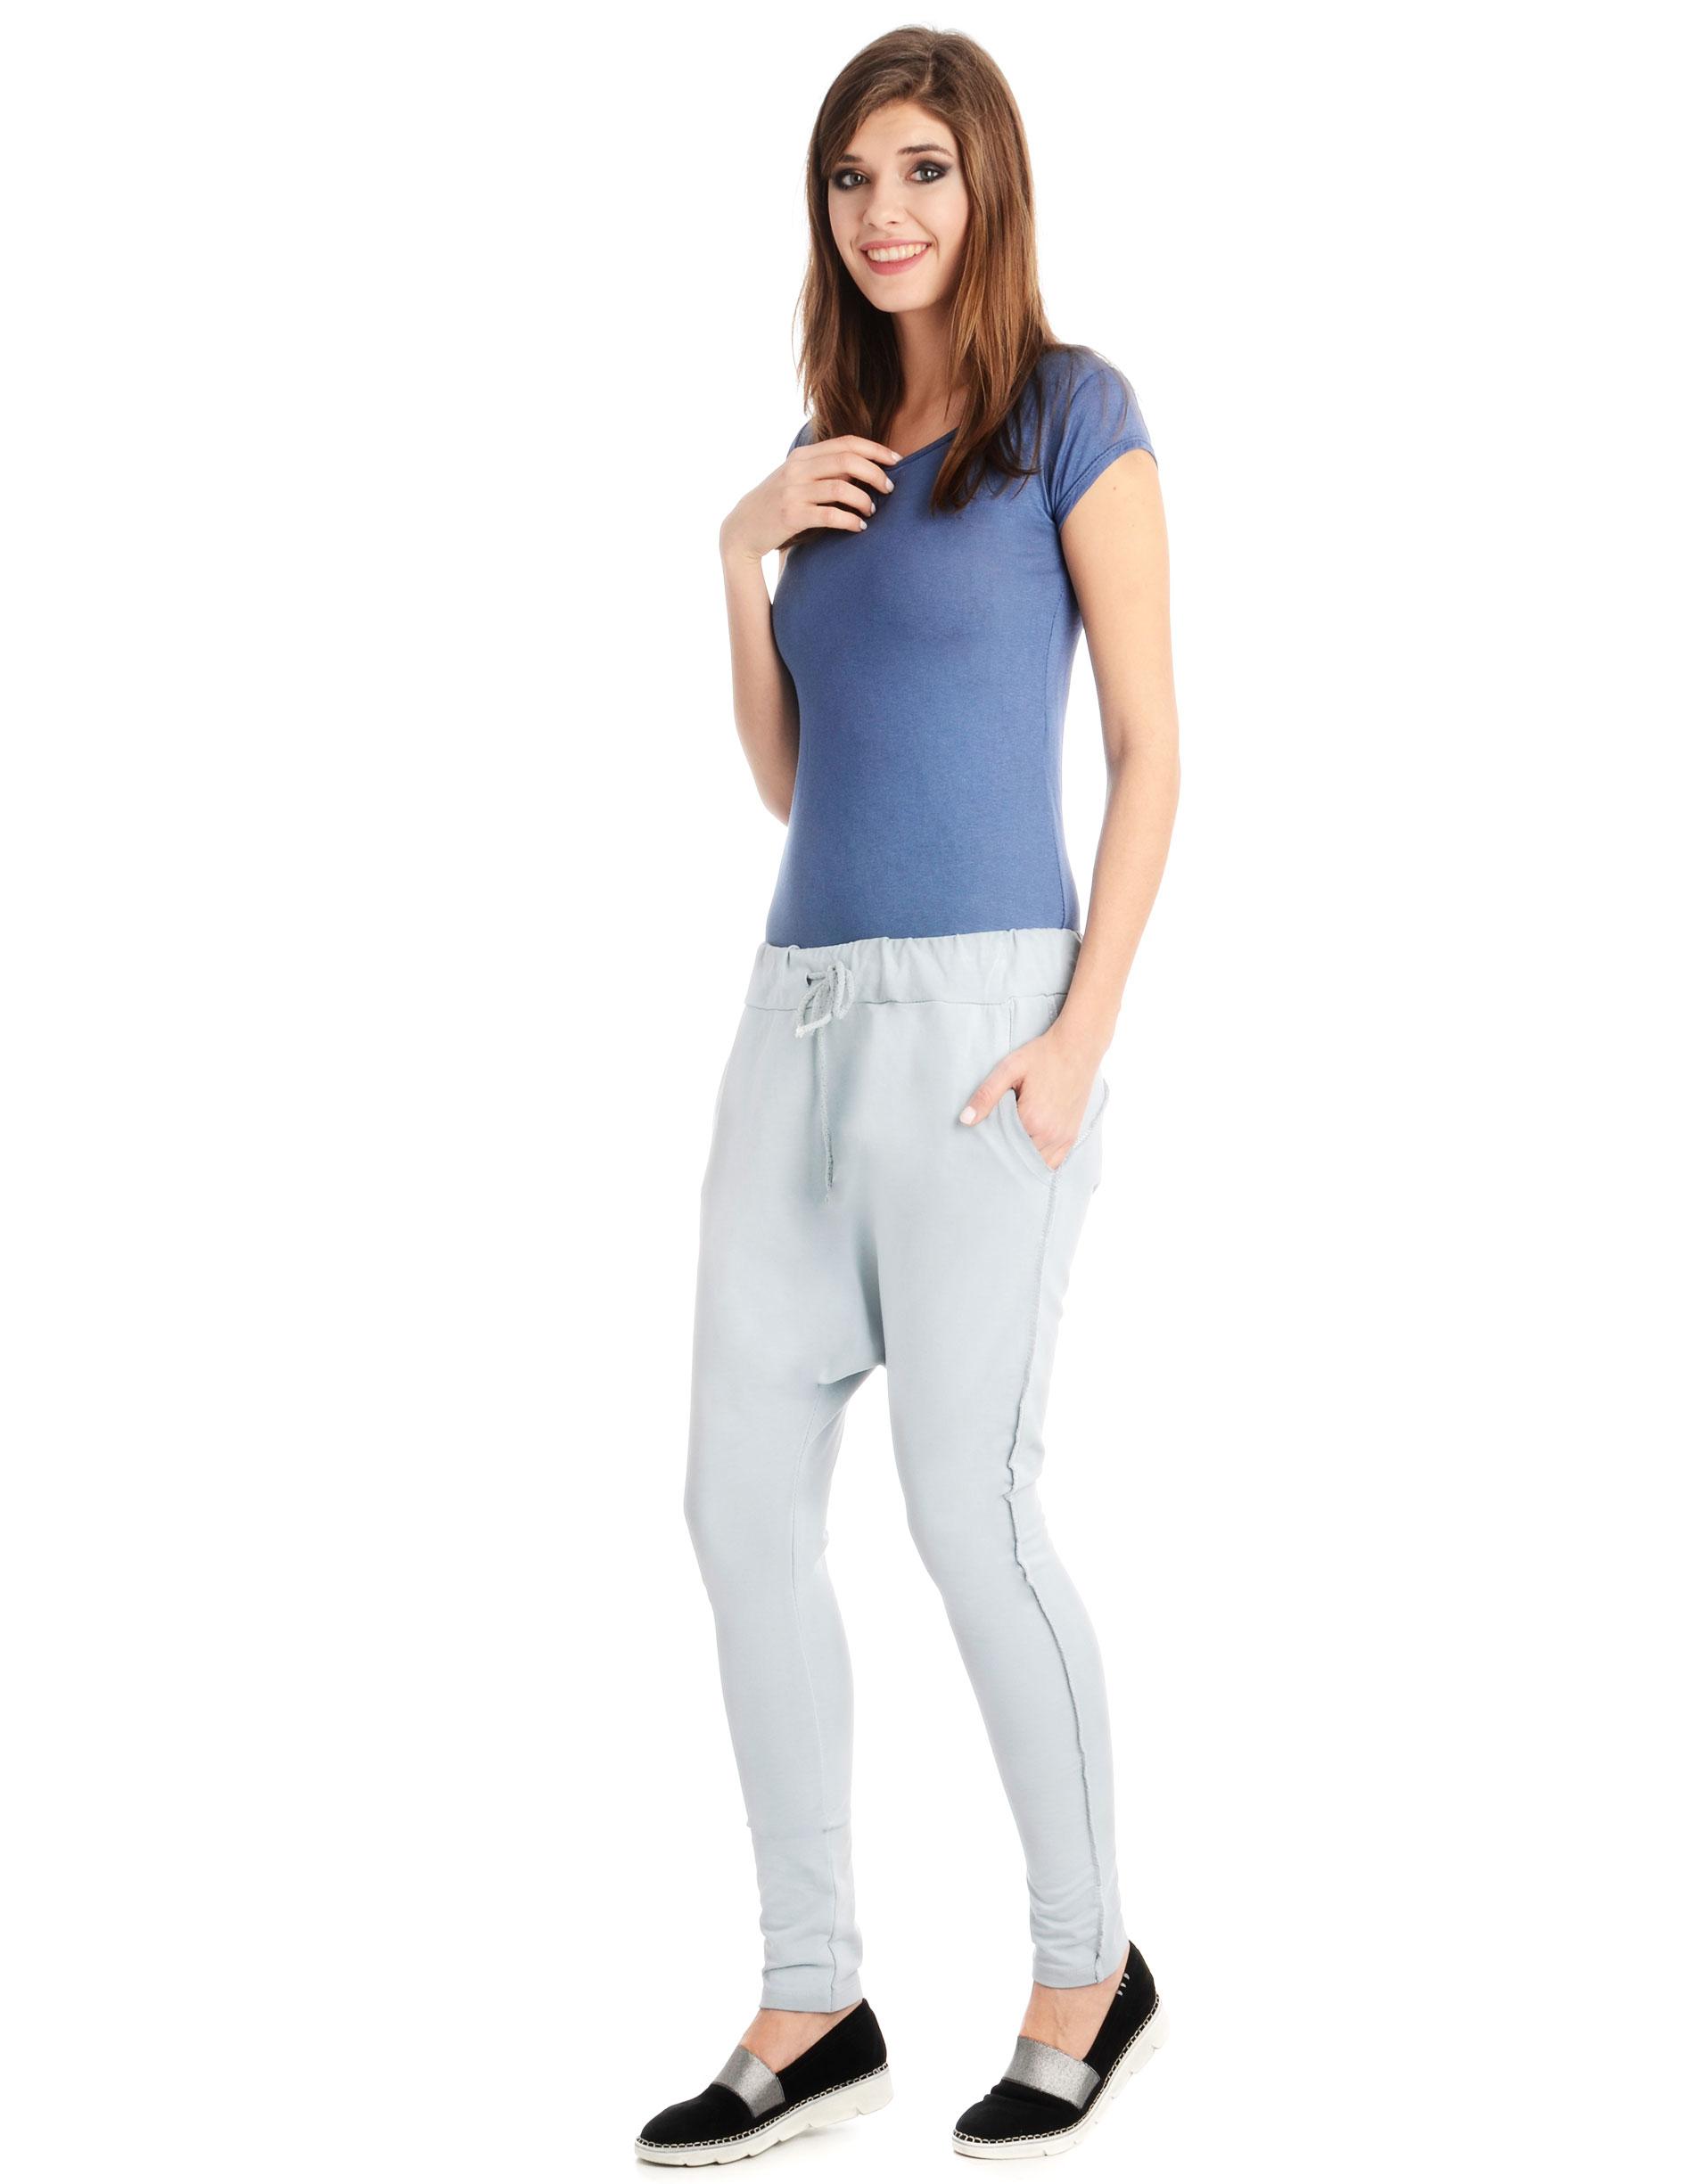 Spodnie - 118-769 PERLA - Unisono